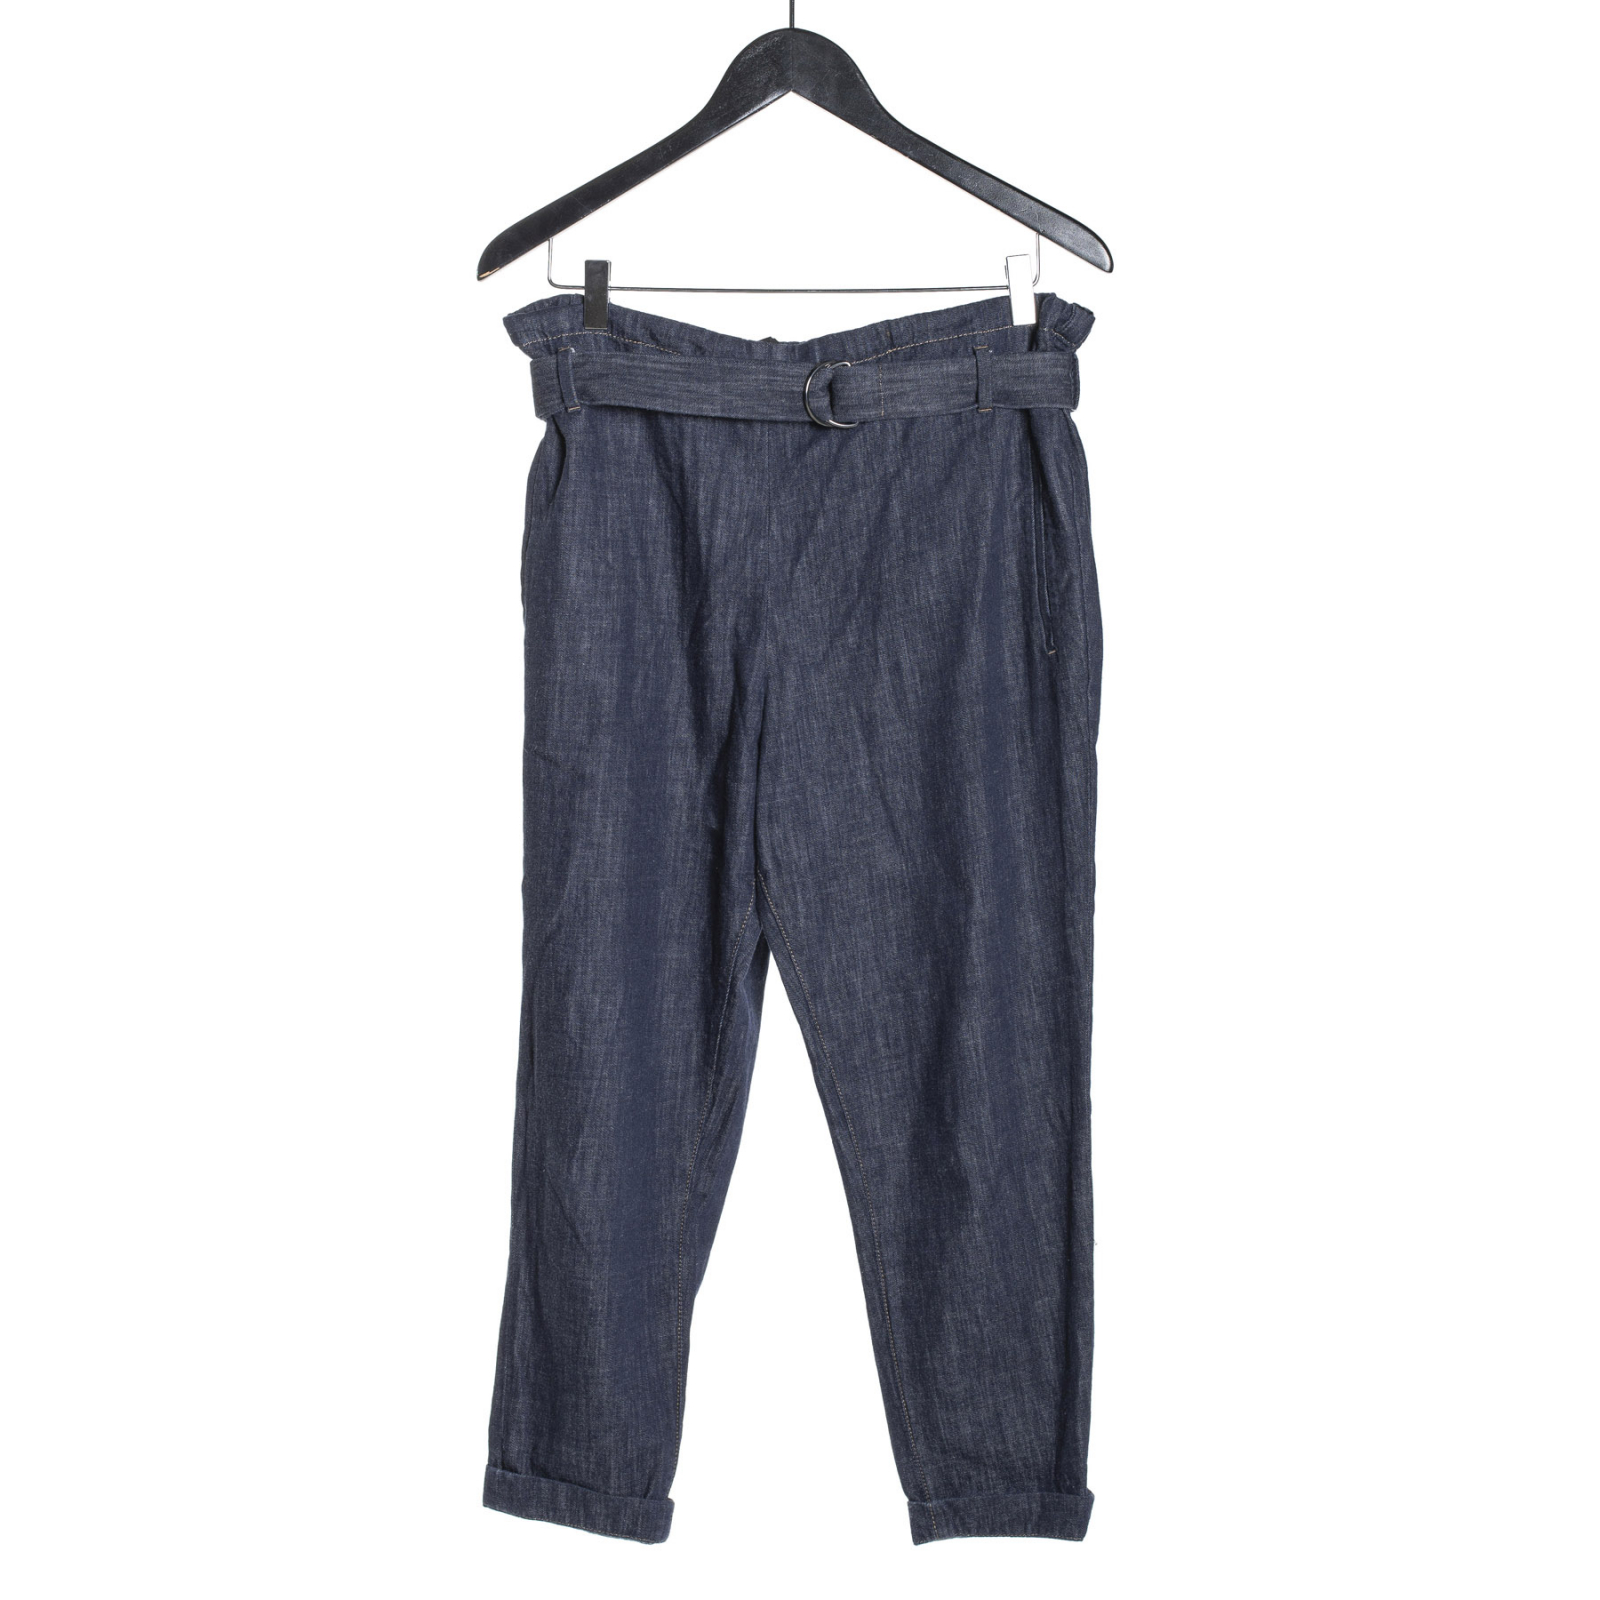 Spodnie Brunello Cucinelli